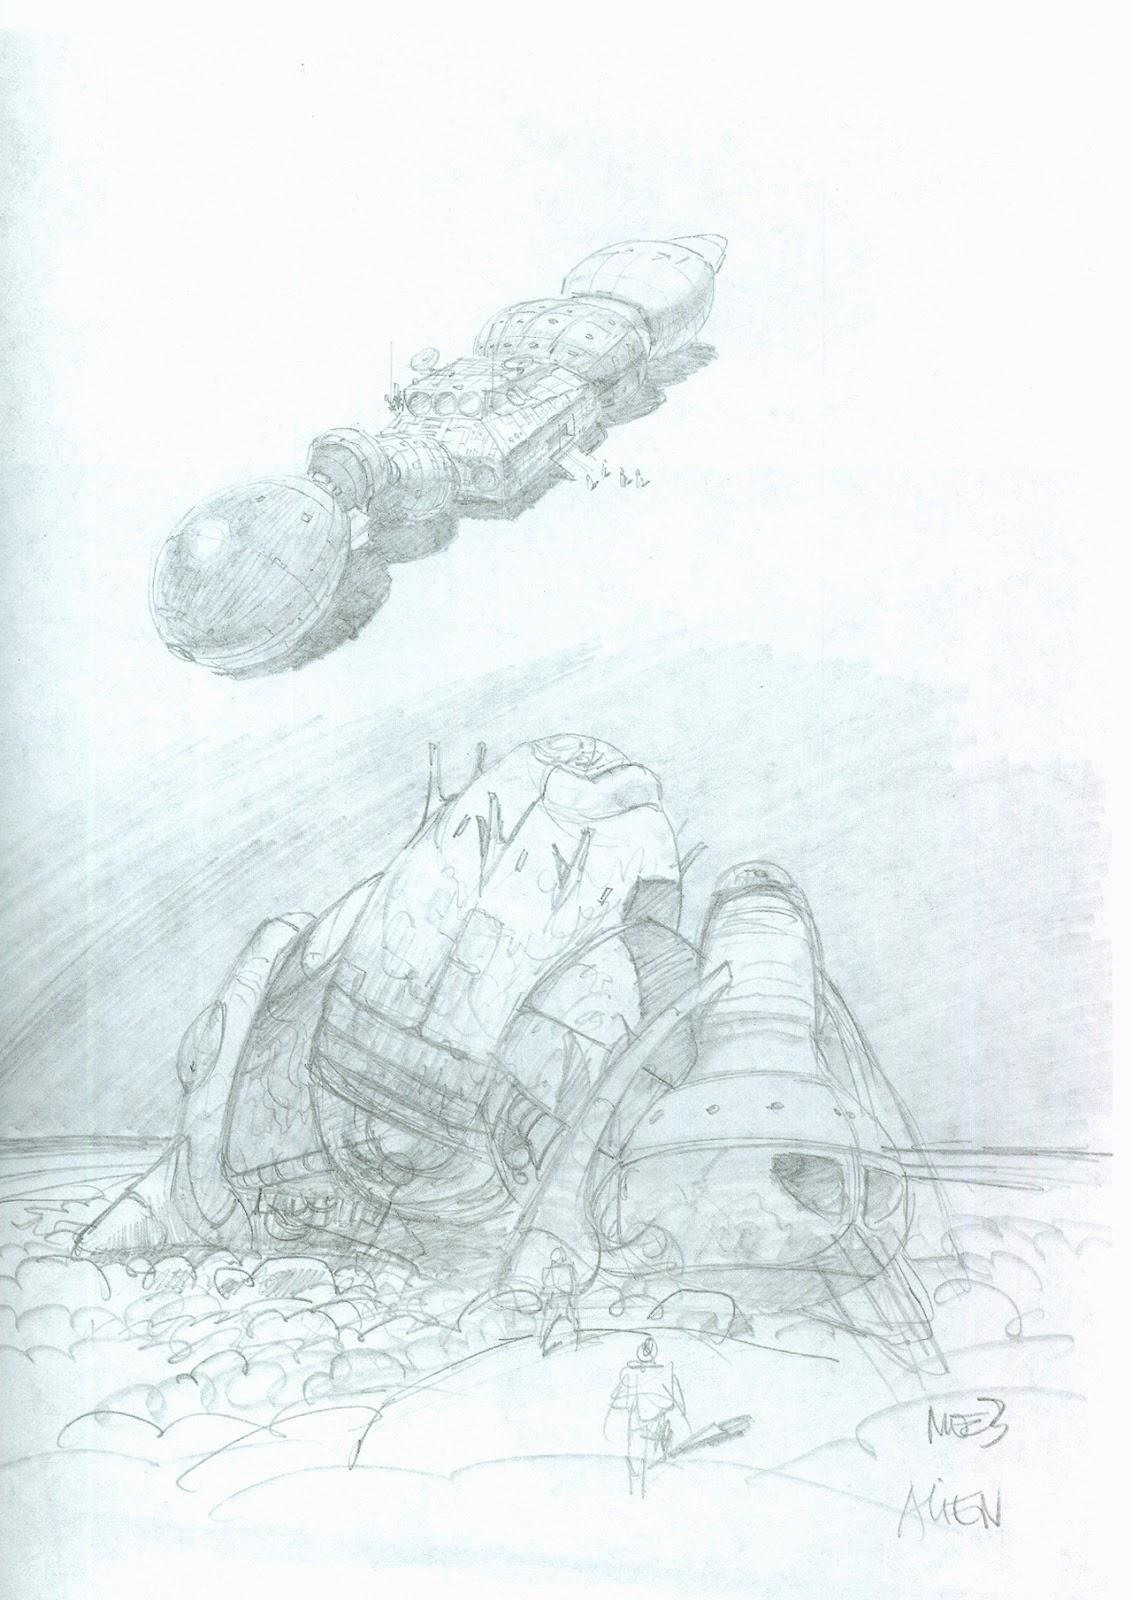 Alien Explorations Alien Moebius Alien Spaceship Concepts For